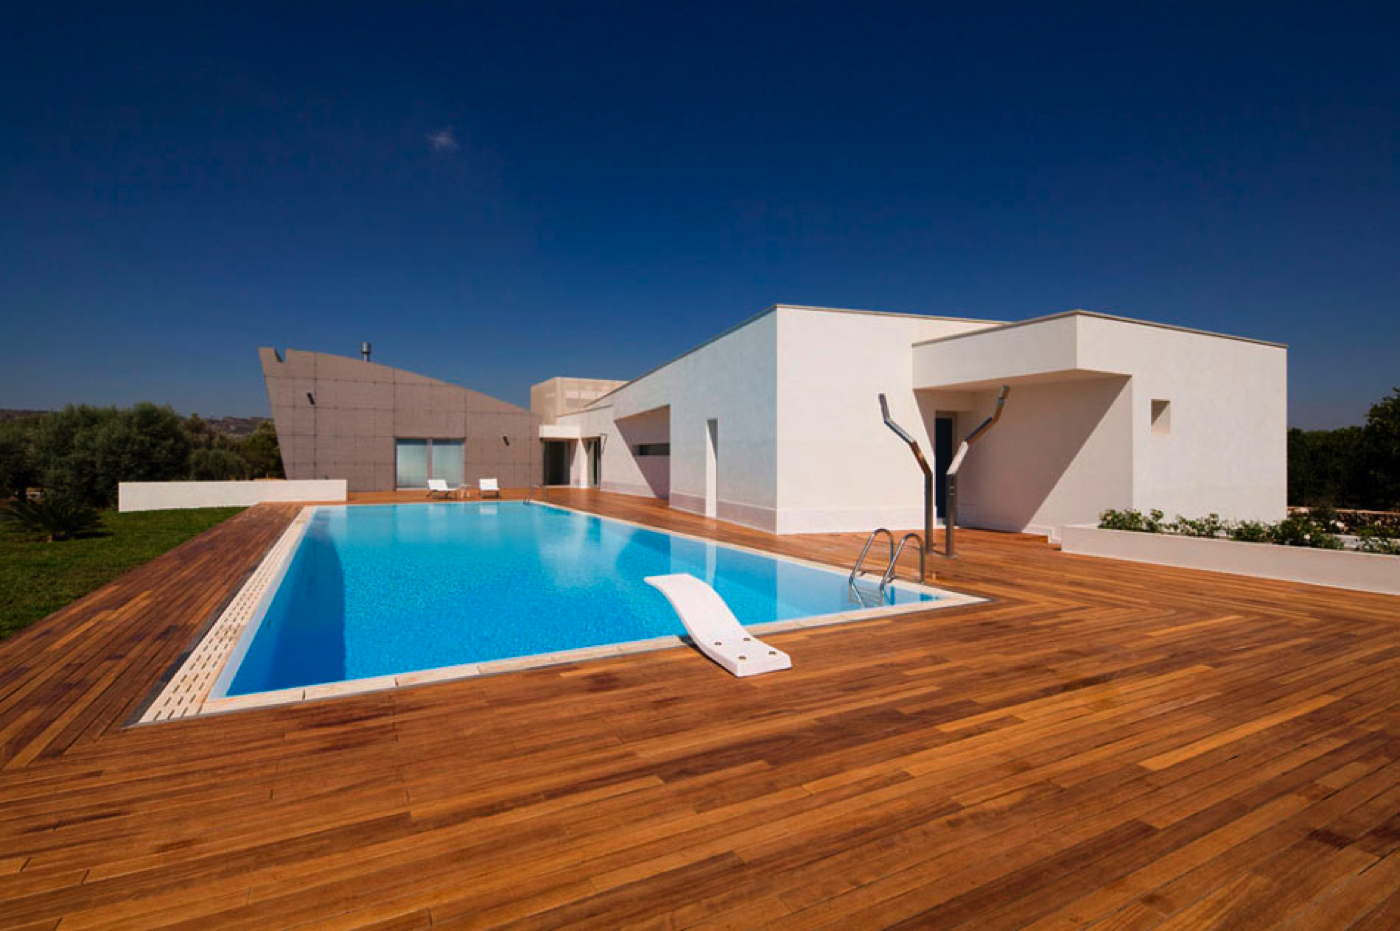 villa mieten italien ferienvilla sizilien ferienhaus. Black Bedroom Furniture Sets. Home Design Ideas